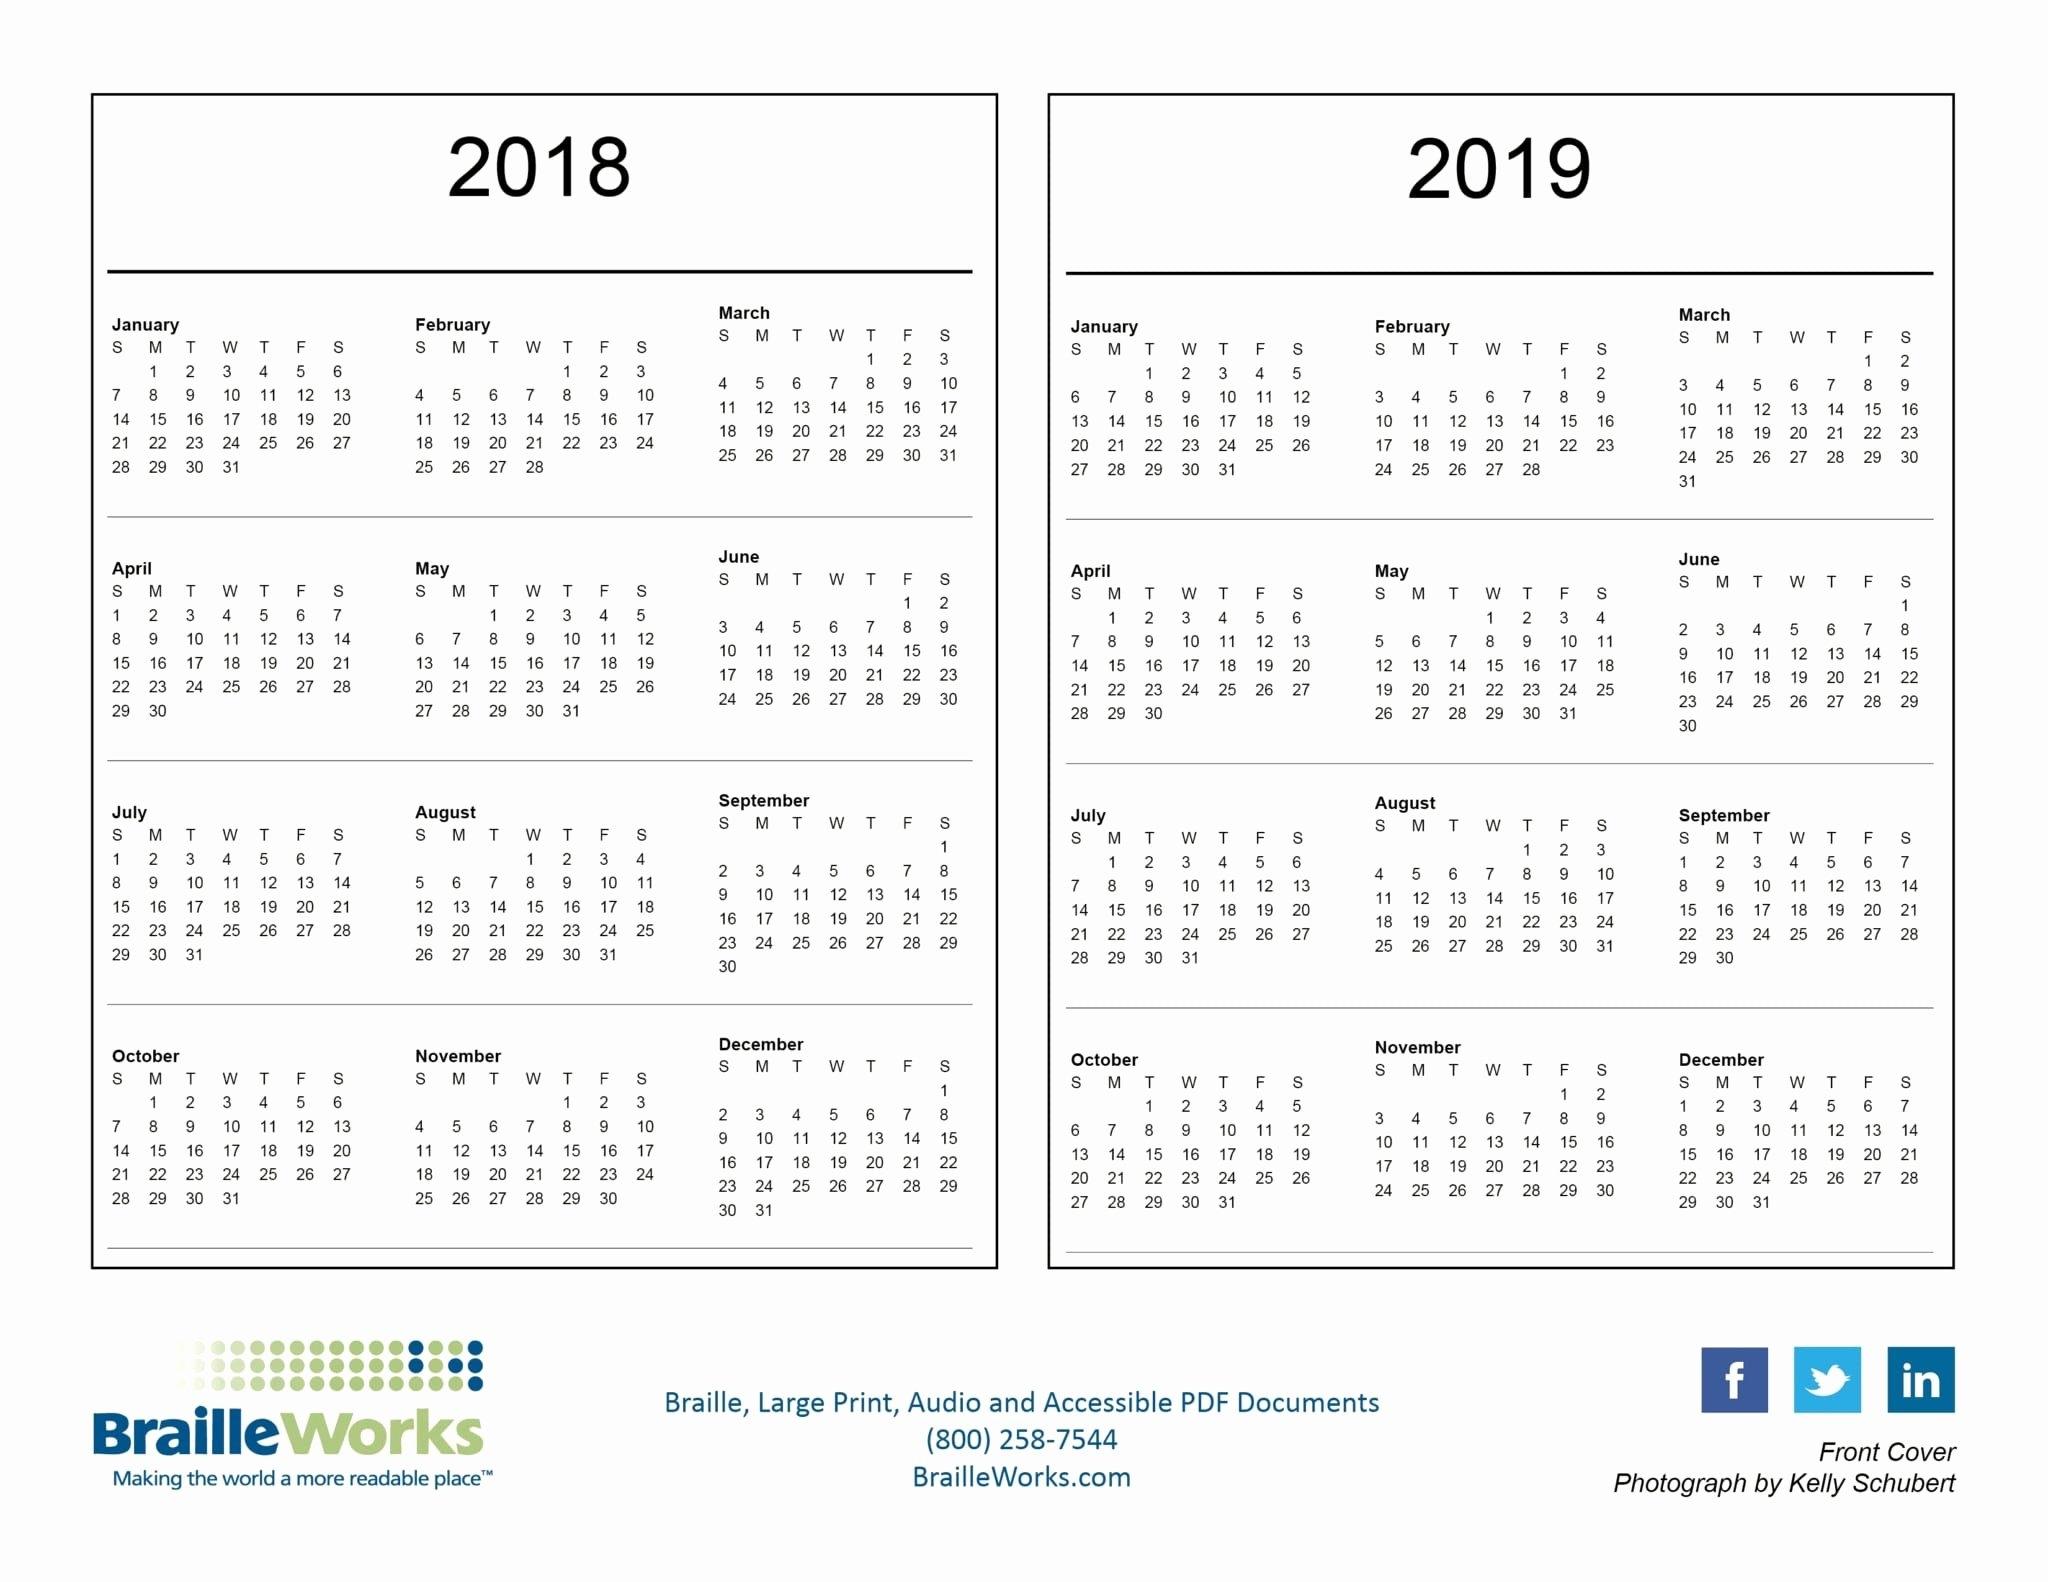 Uconn Academic Calendar 2018 2019 Braille Calendars Attractive And Calendar 2019 Uconn